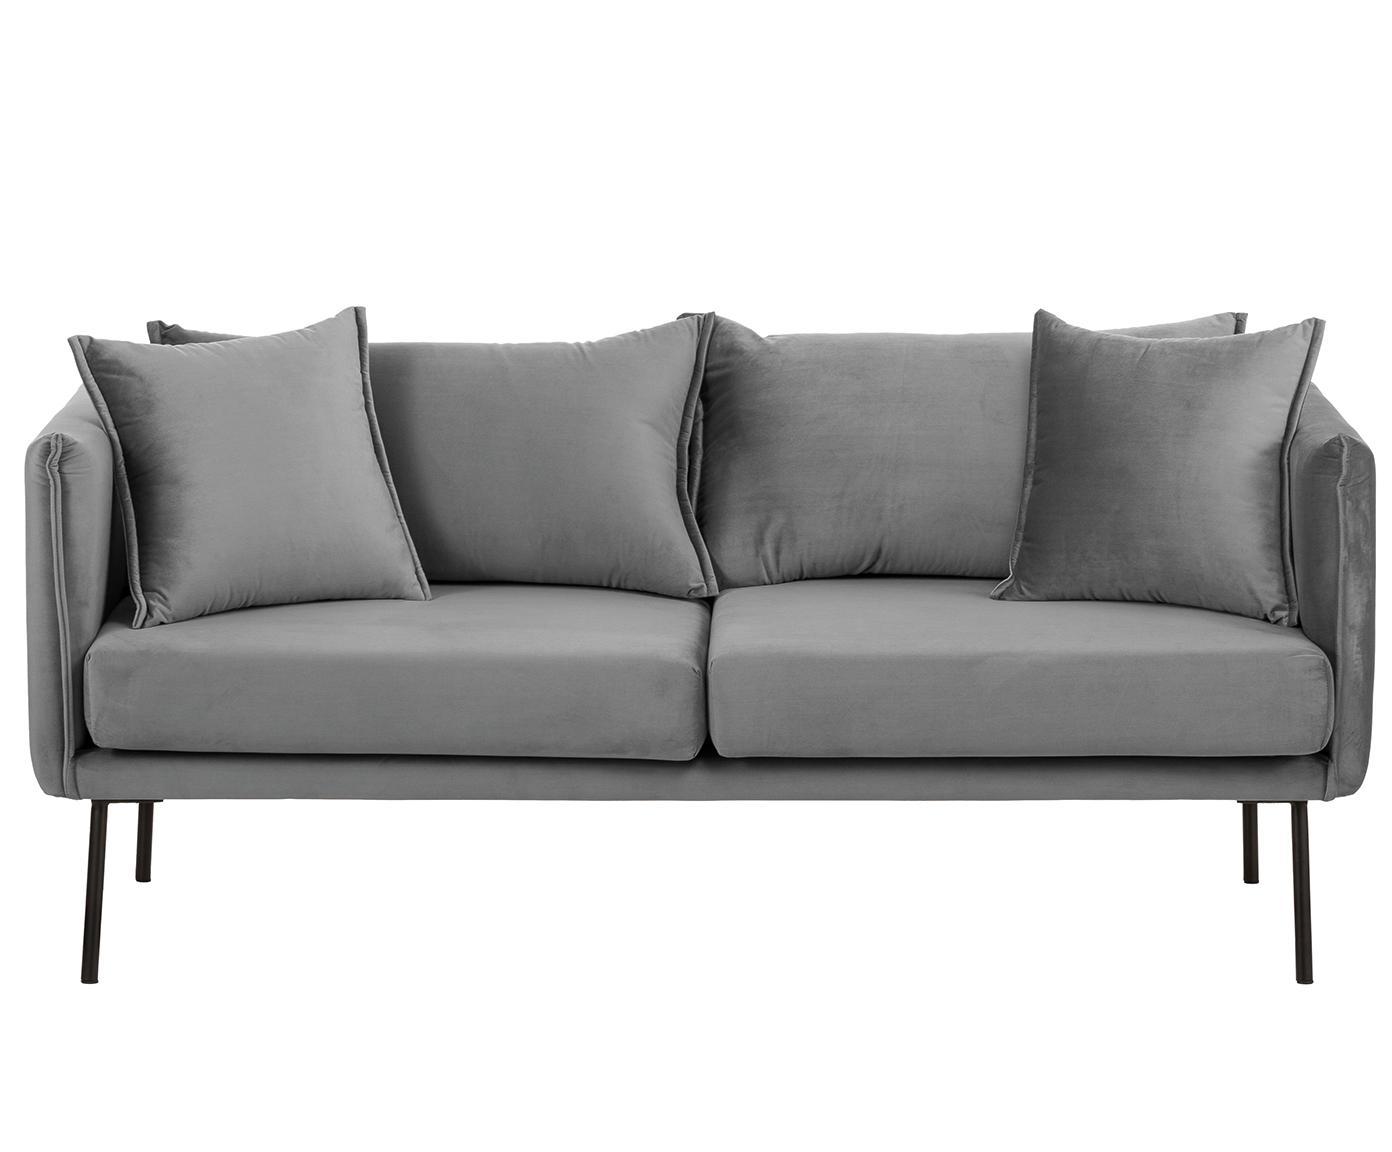 Samt-Sofa Ivy (2-Sitzer), Bezug: Samt (Polyester) 15.000 S, Gestell: Metall, Samt Grau, B 170 x T 75 cm